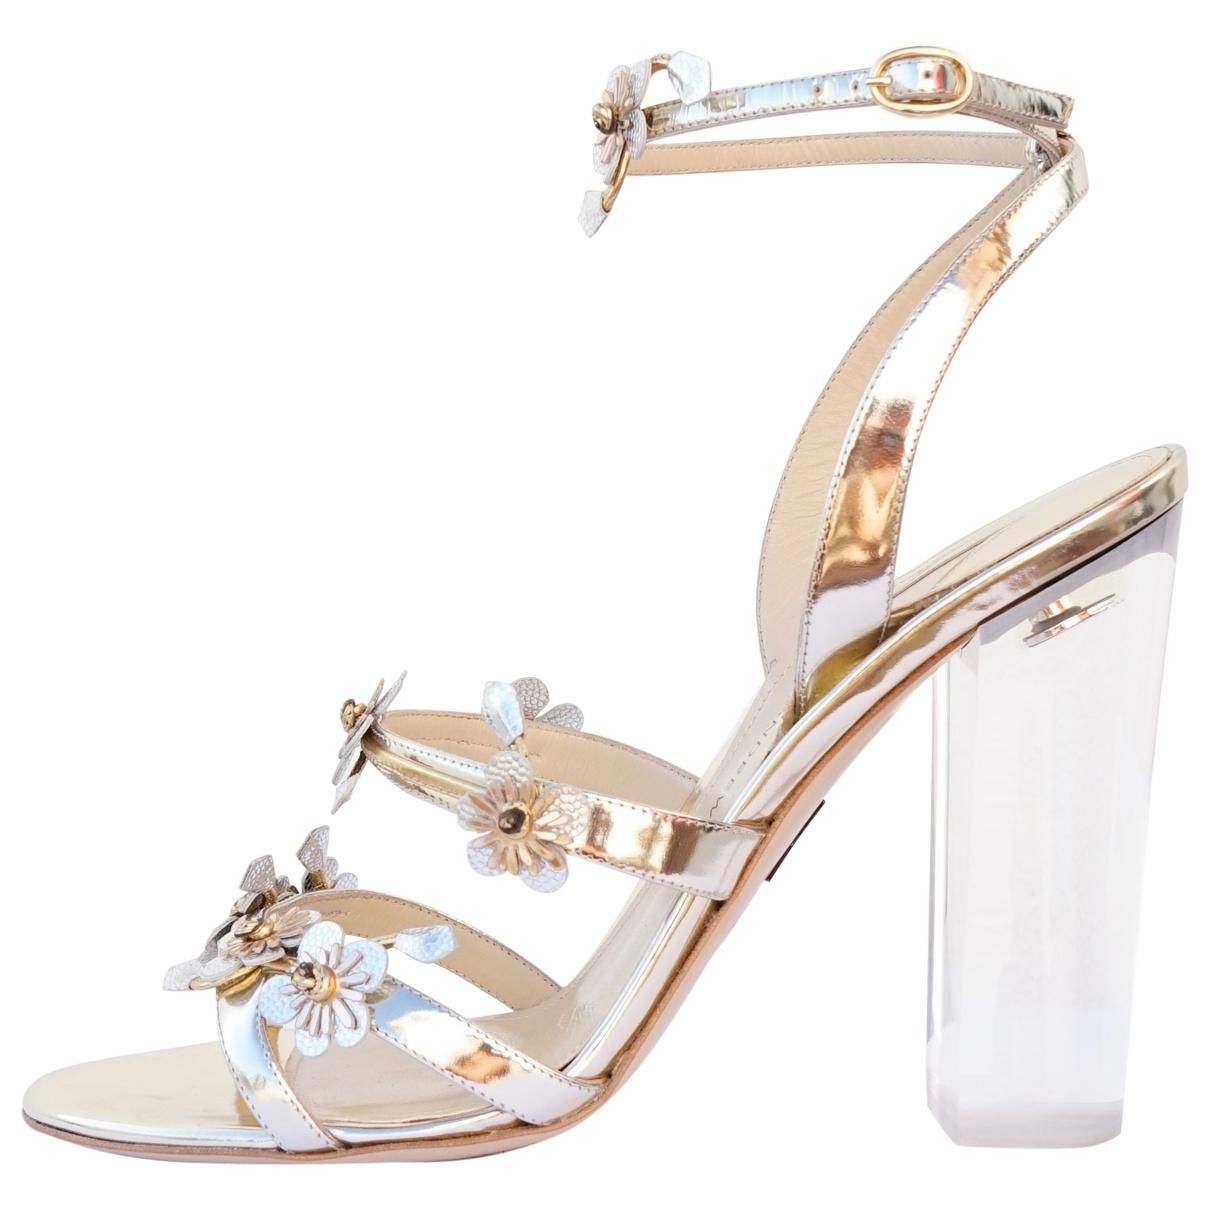 Paul Andrew \N Metallic Leather Sandals for Women 40 EU